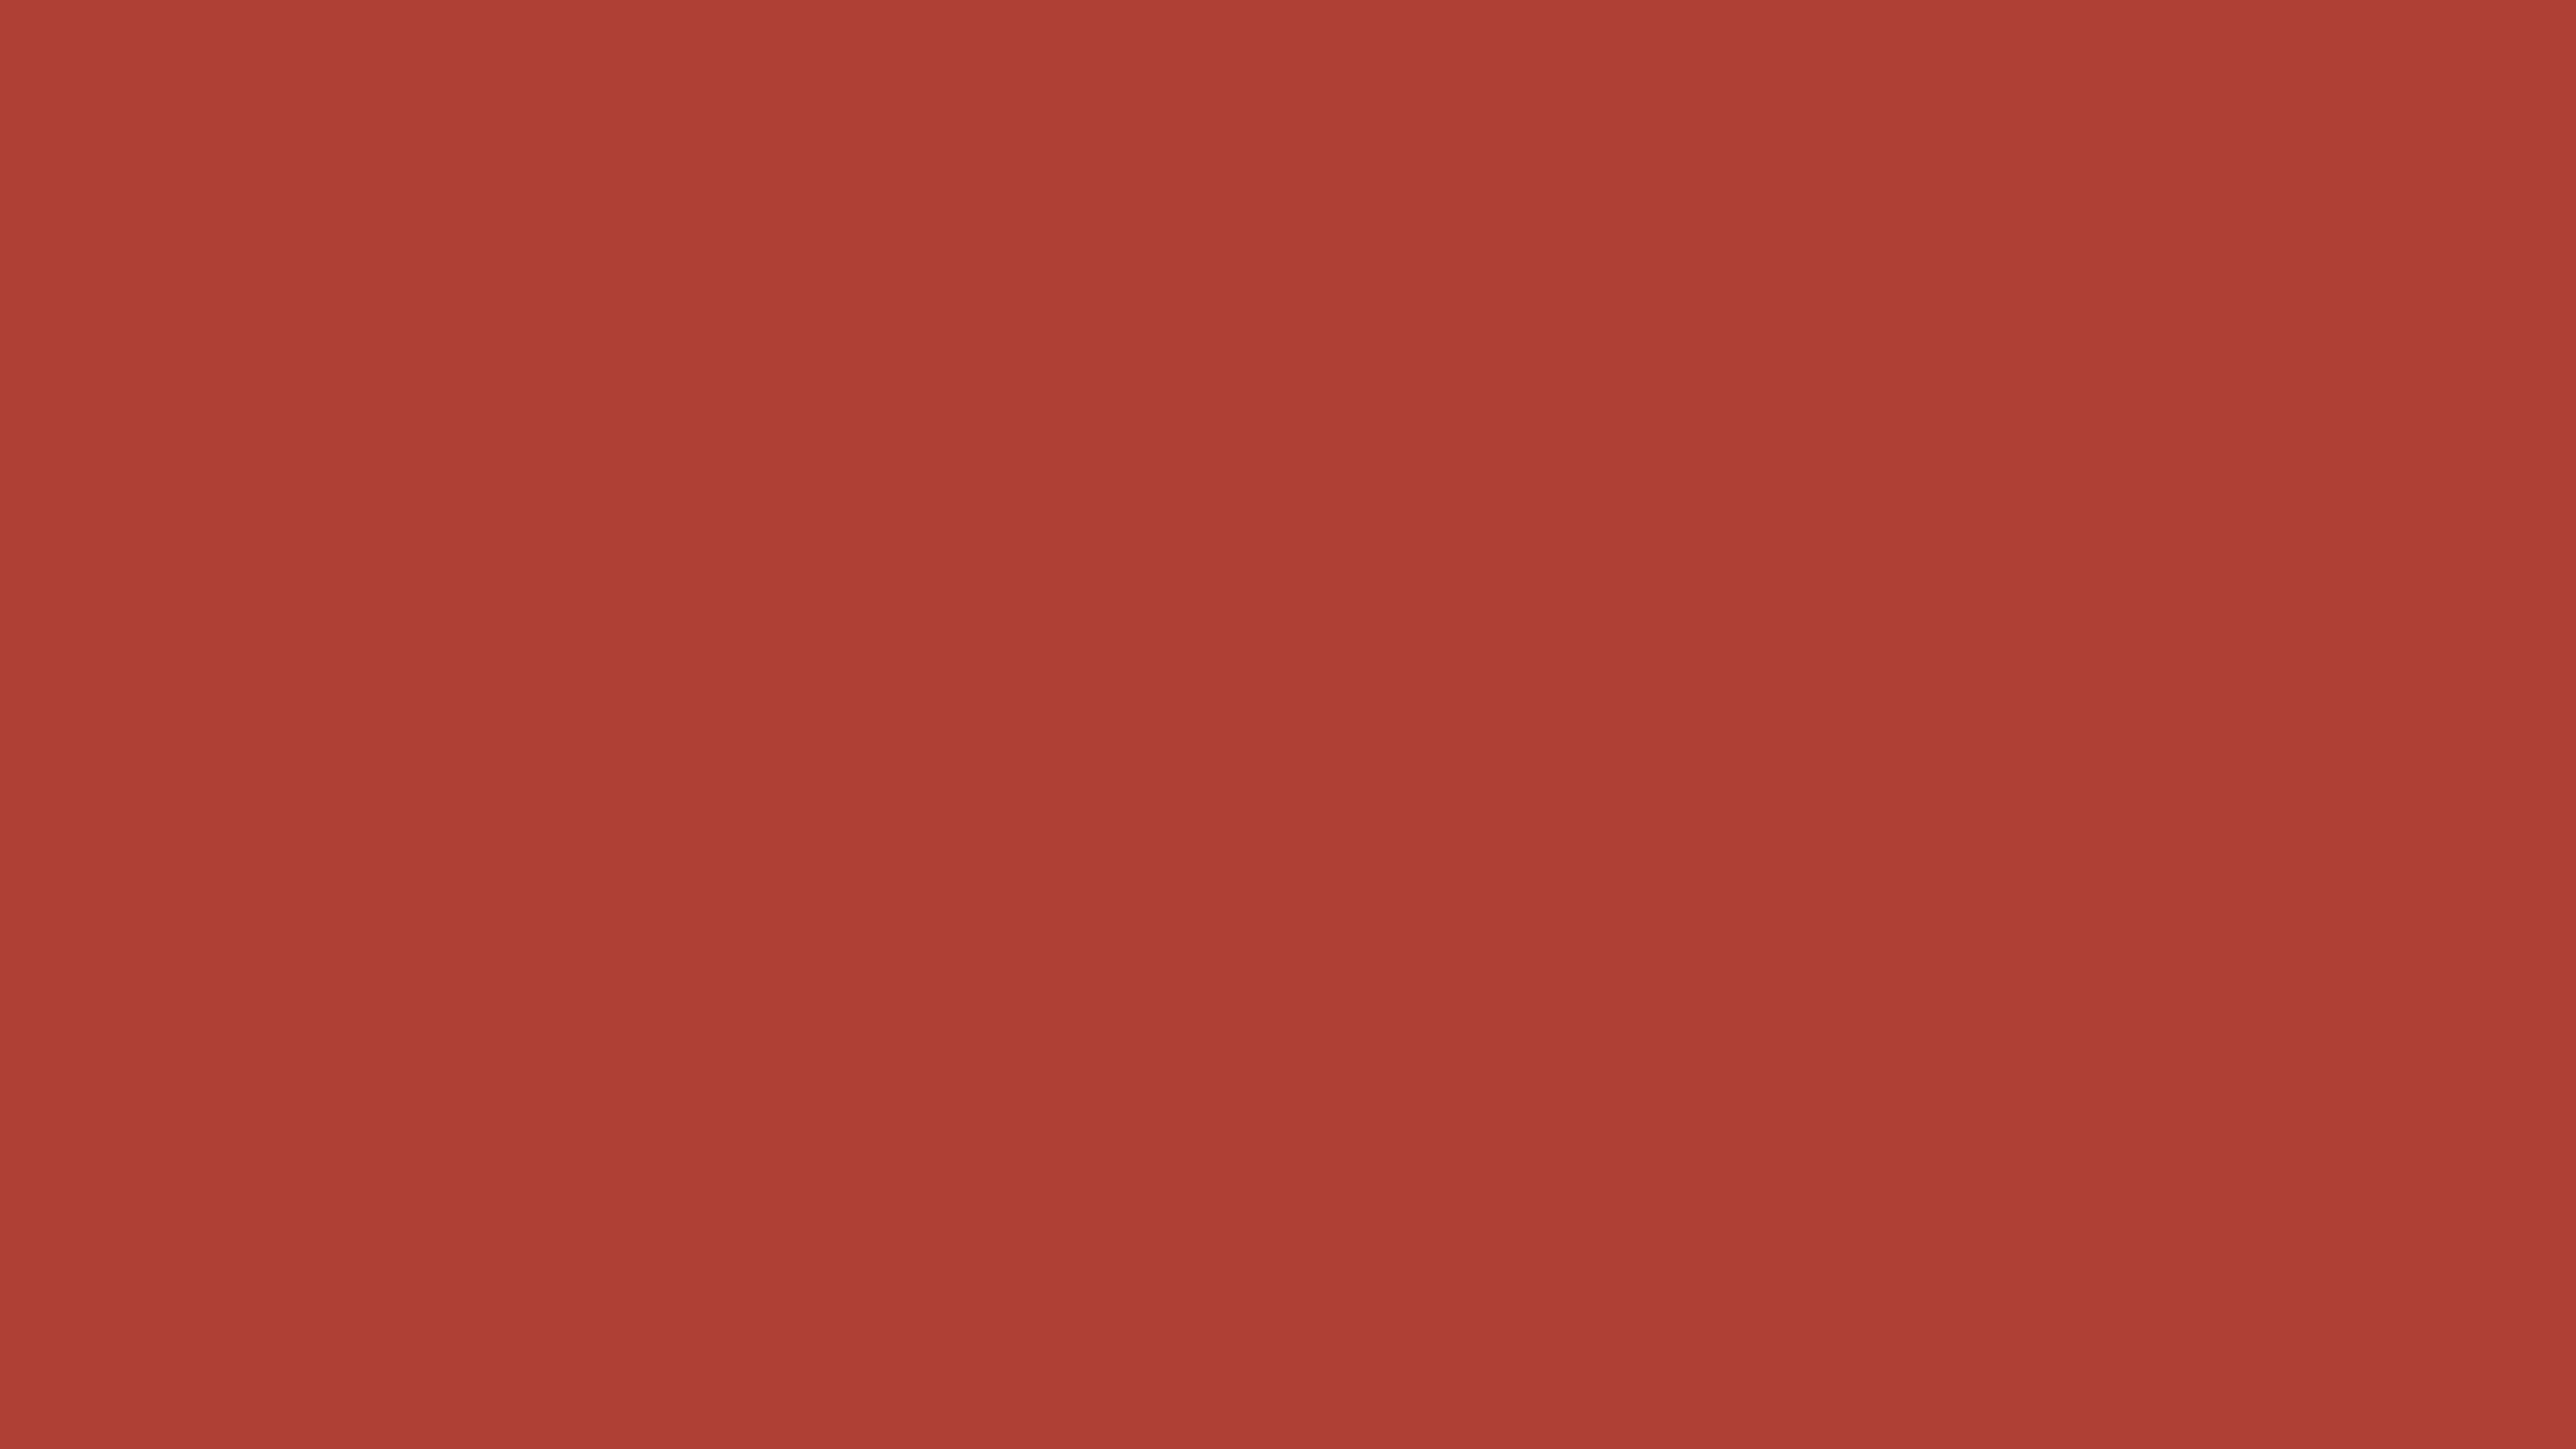 3840x2160 Pale Carmine Solid Color Background